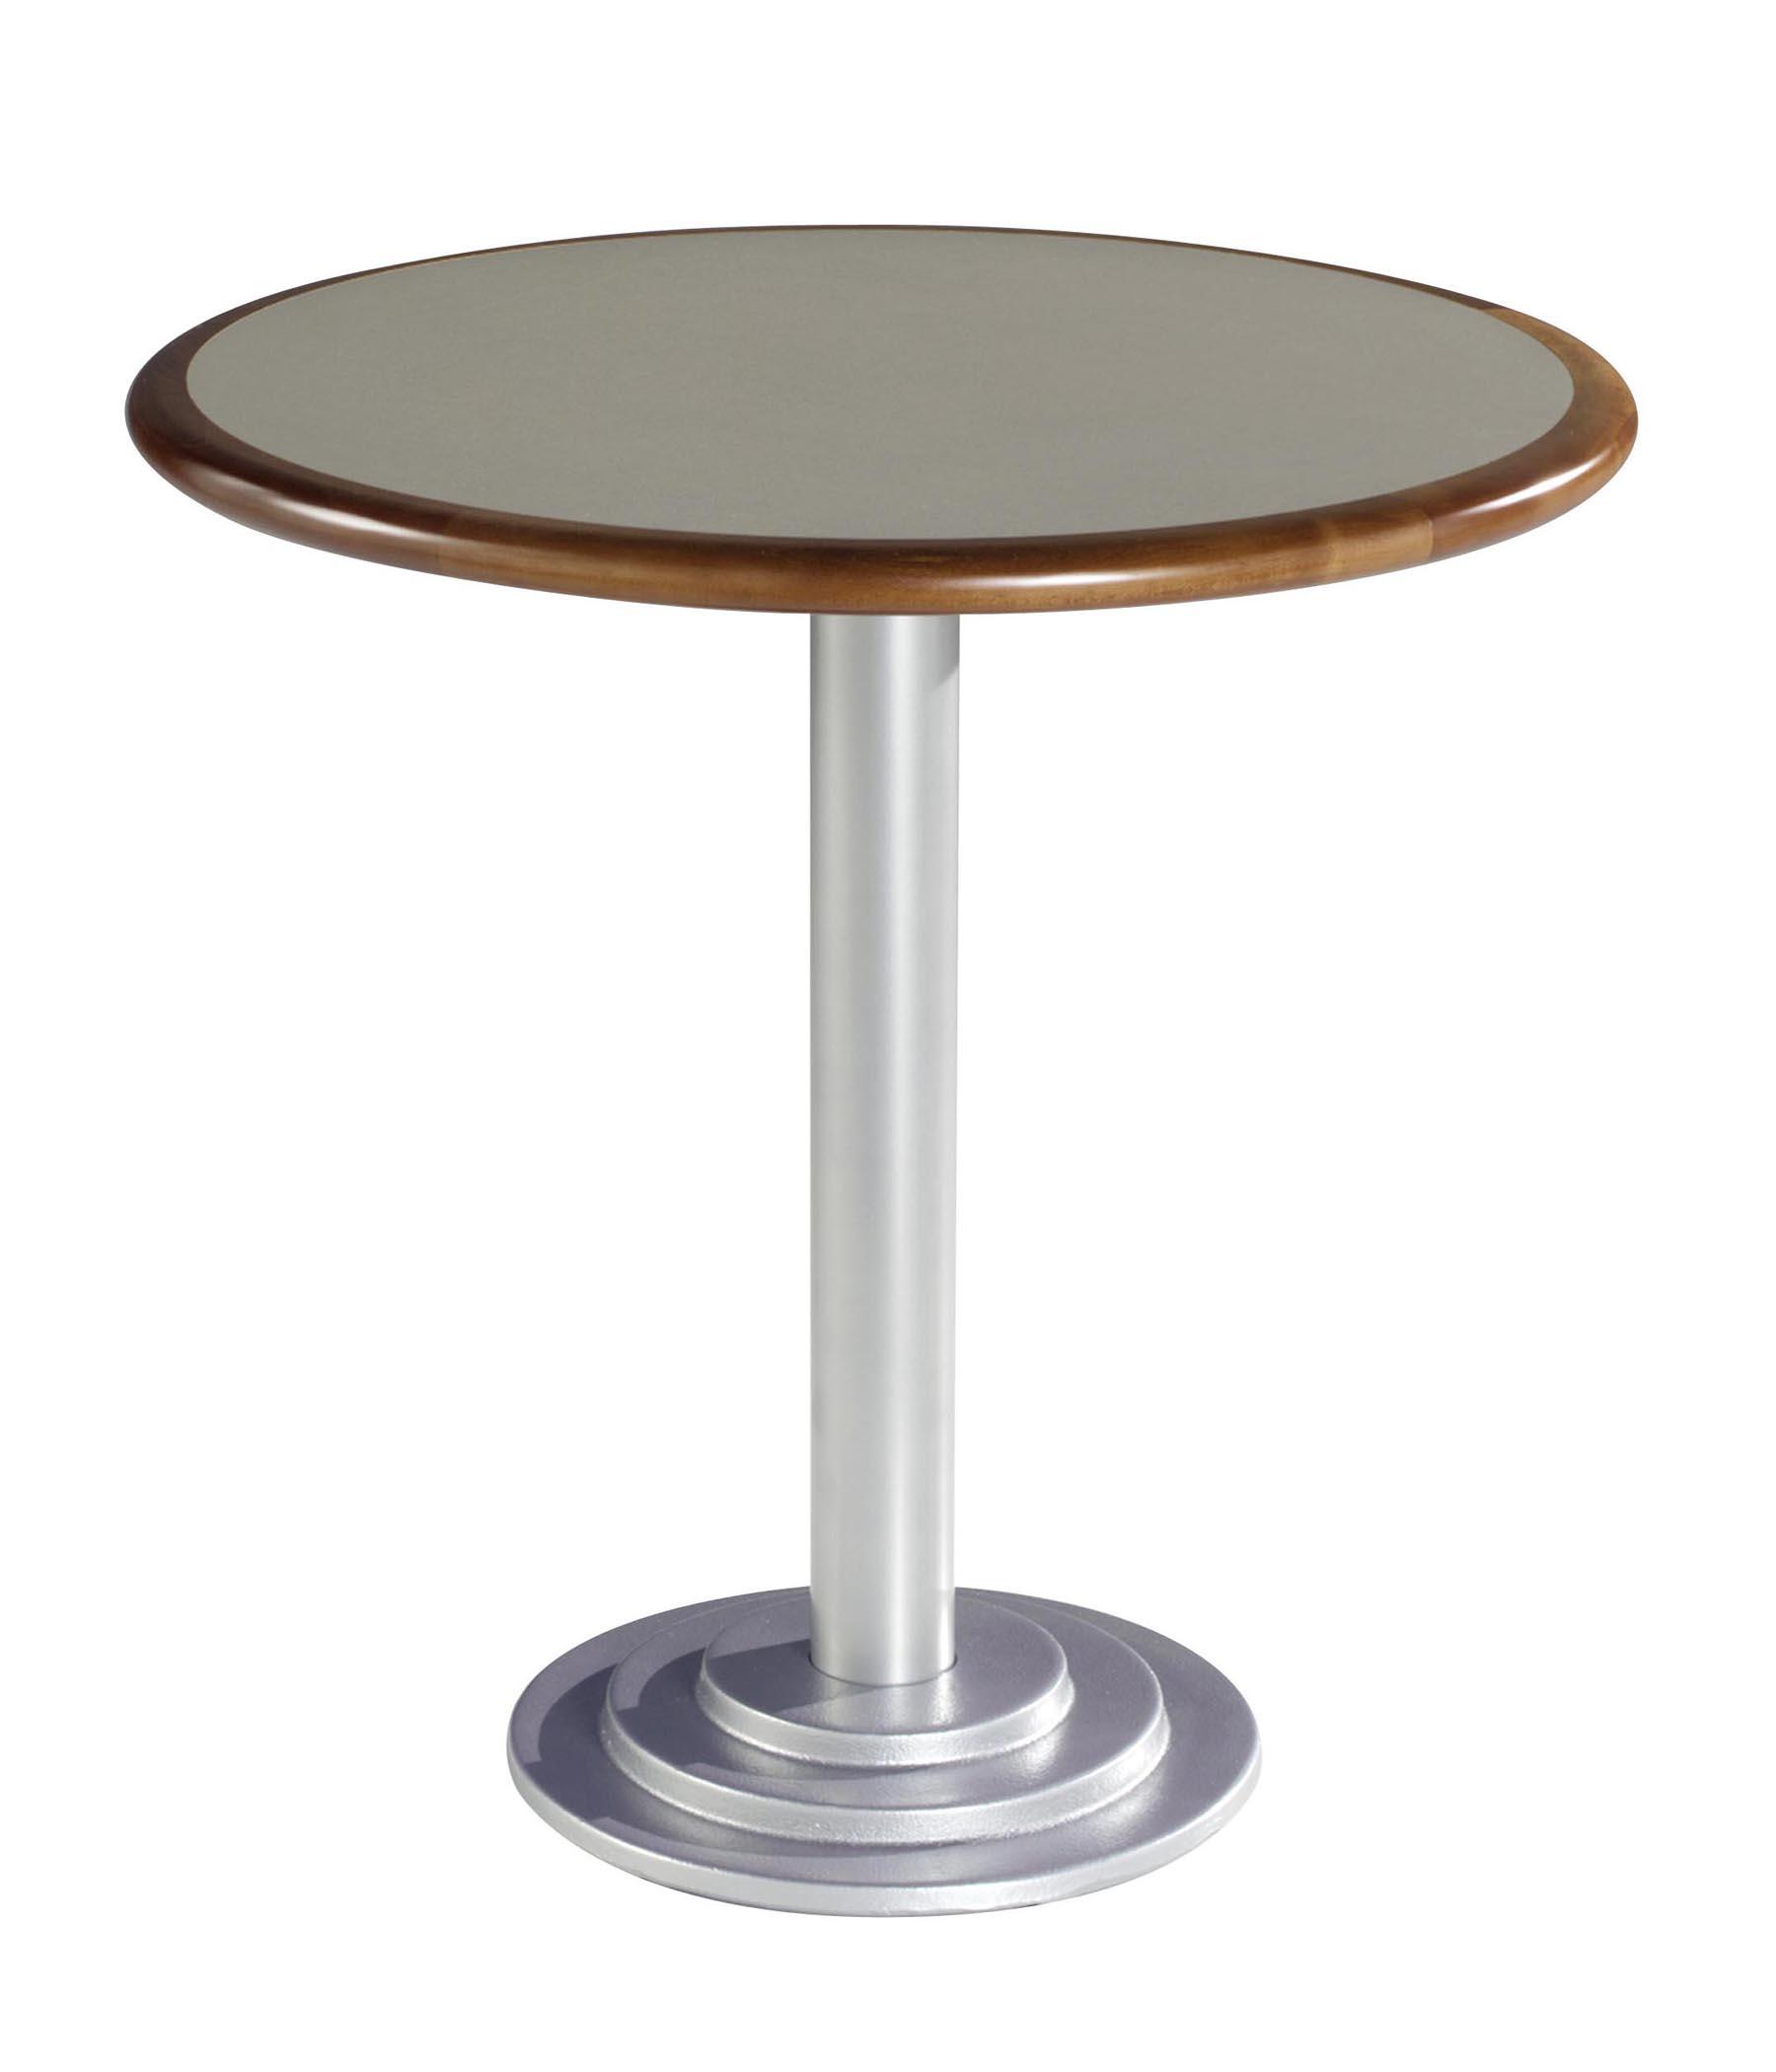 b85 series table base